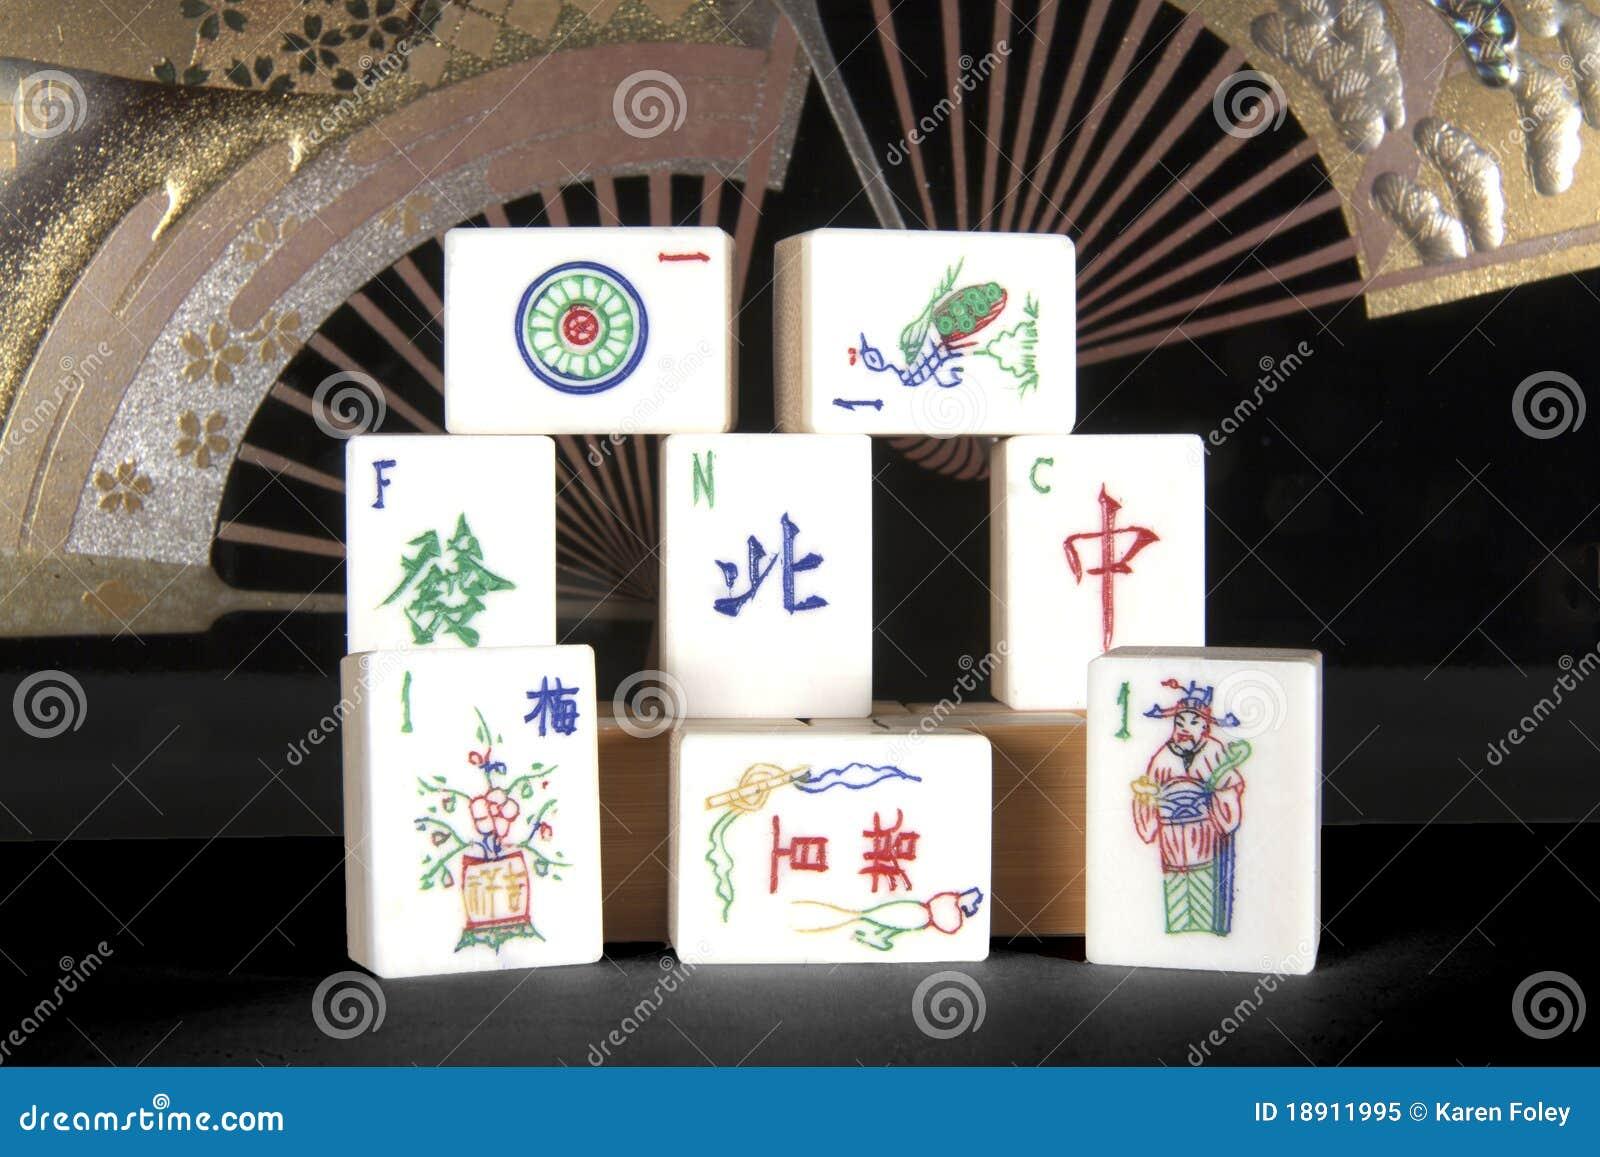 play mahjongg dark dimensions free online